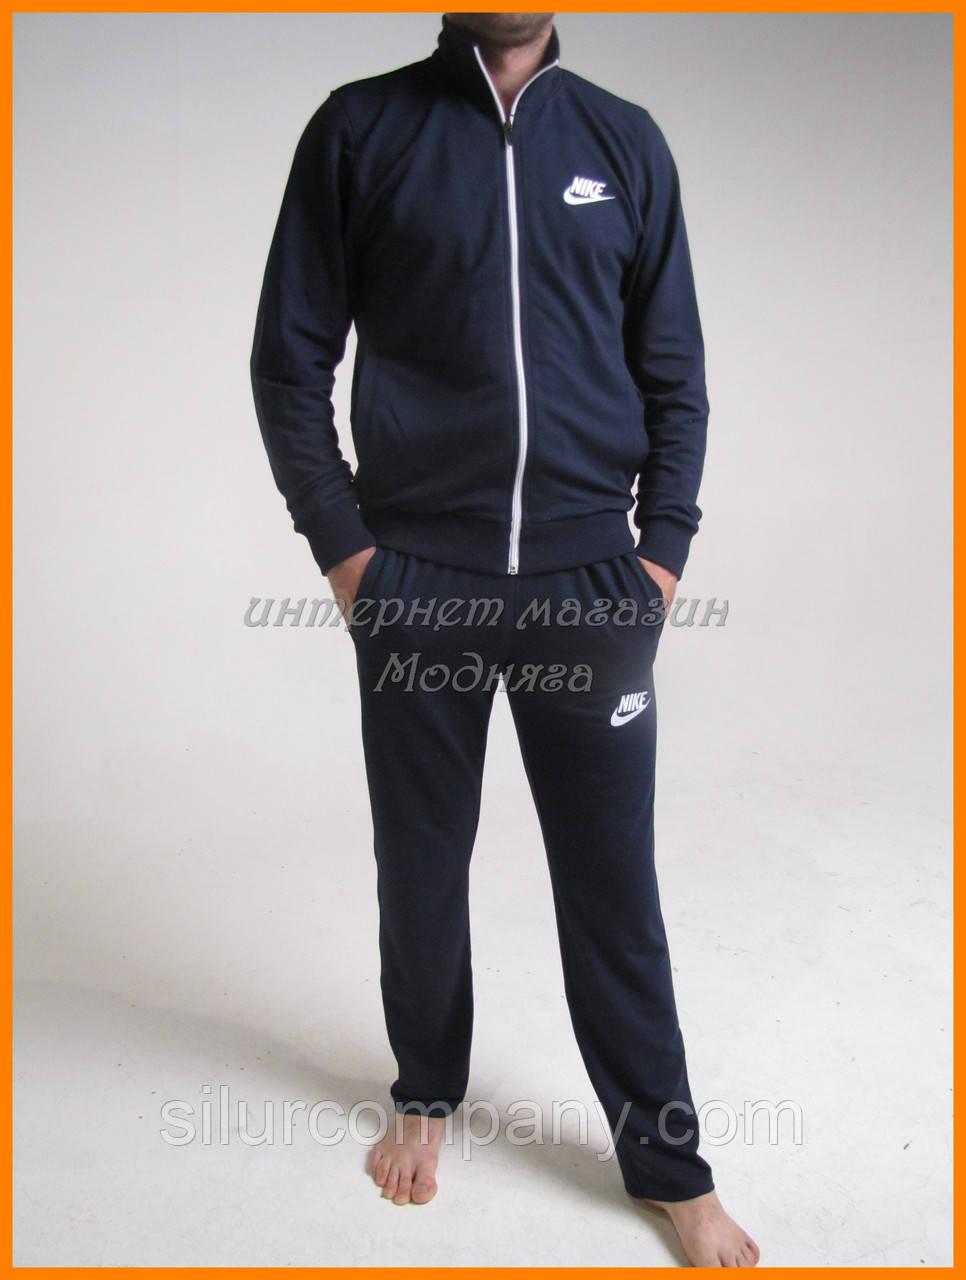 938936f3909e Мужской спортивный костюм Nike трикотажный цвет темно-синий - Интернет  магазин